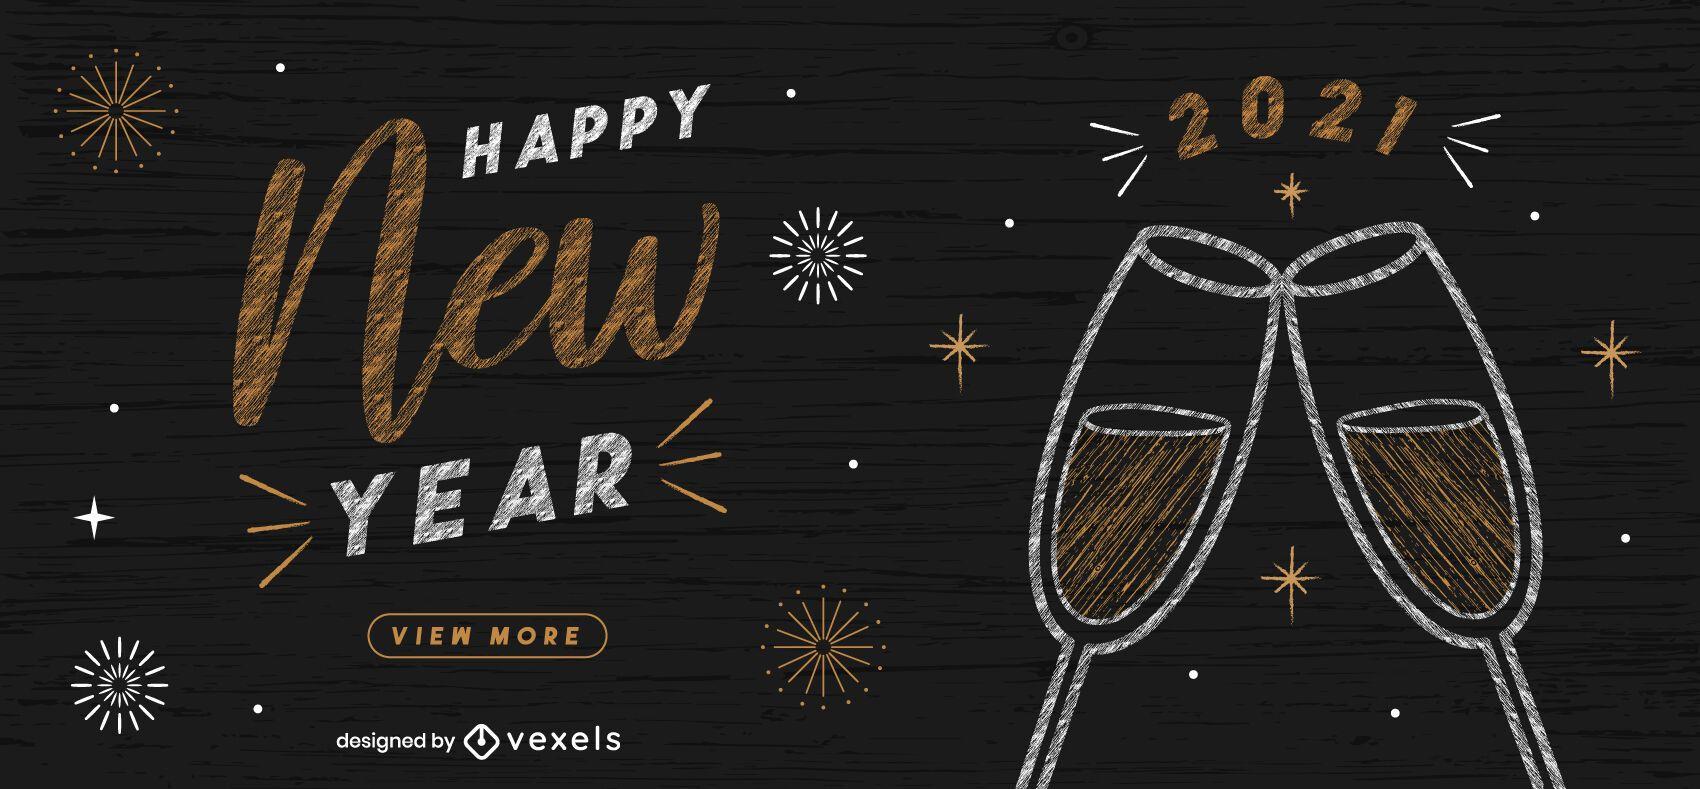 Happy new year web slider design